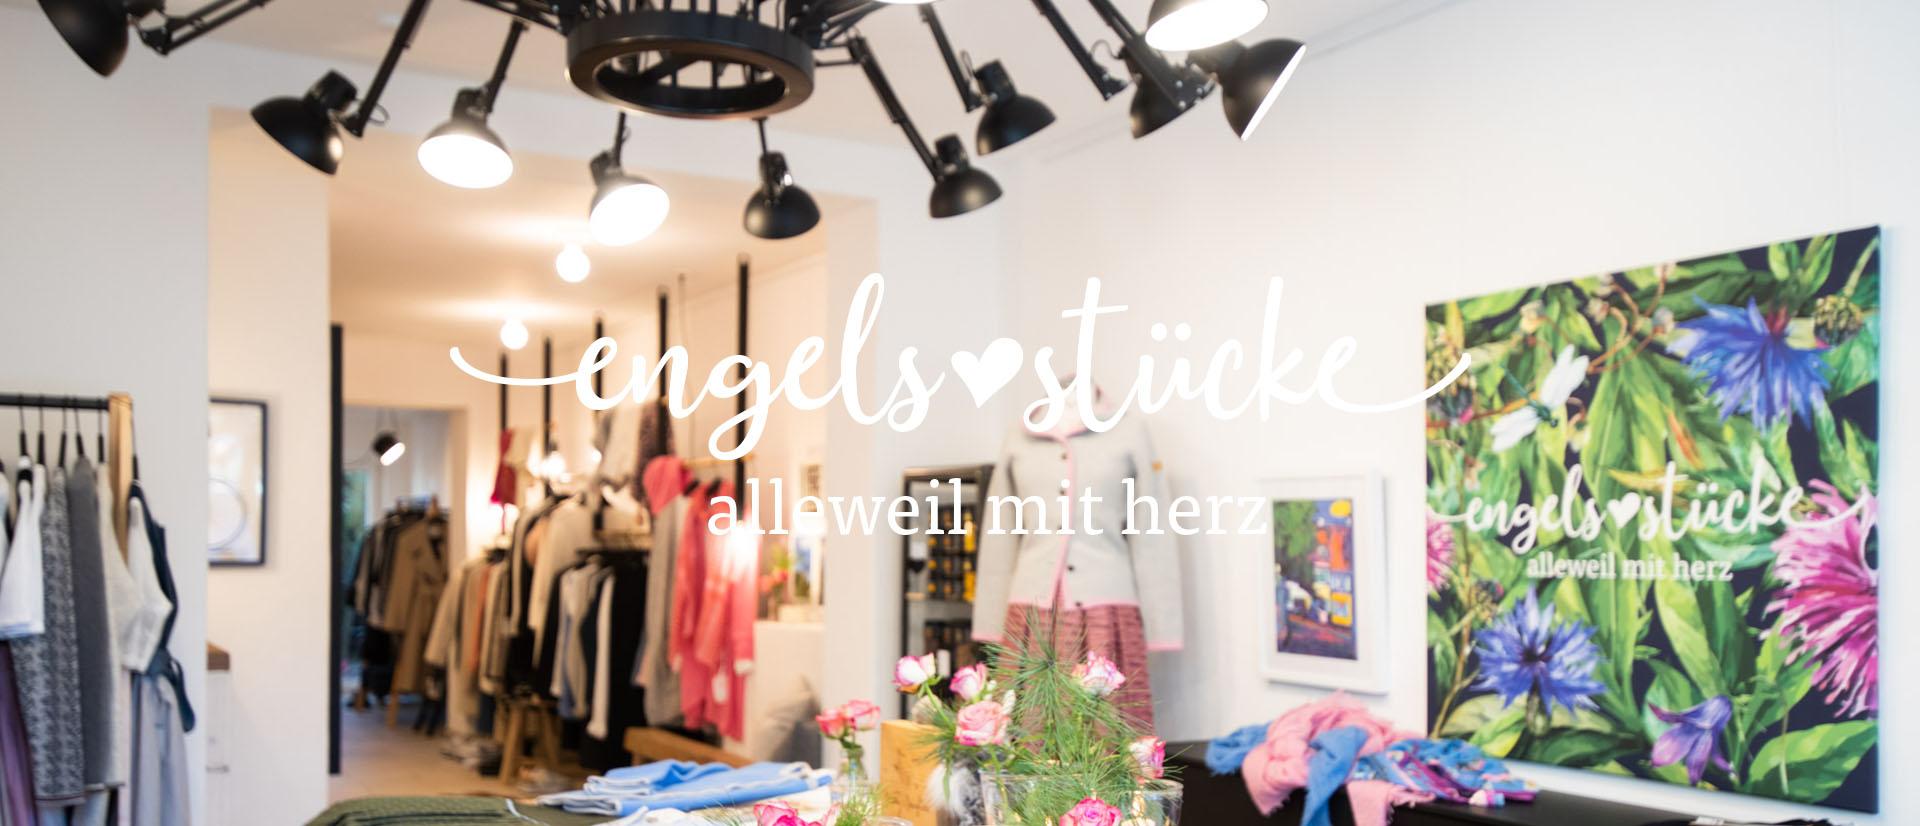 engelsstücke_concept_store_04